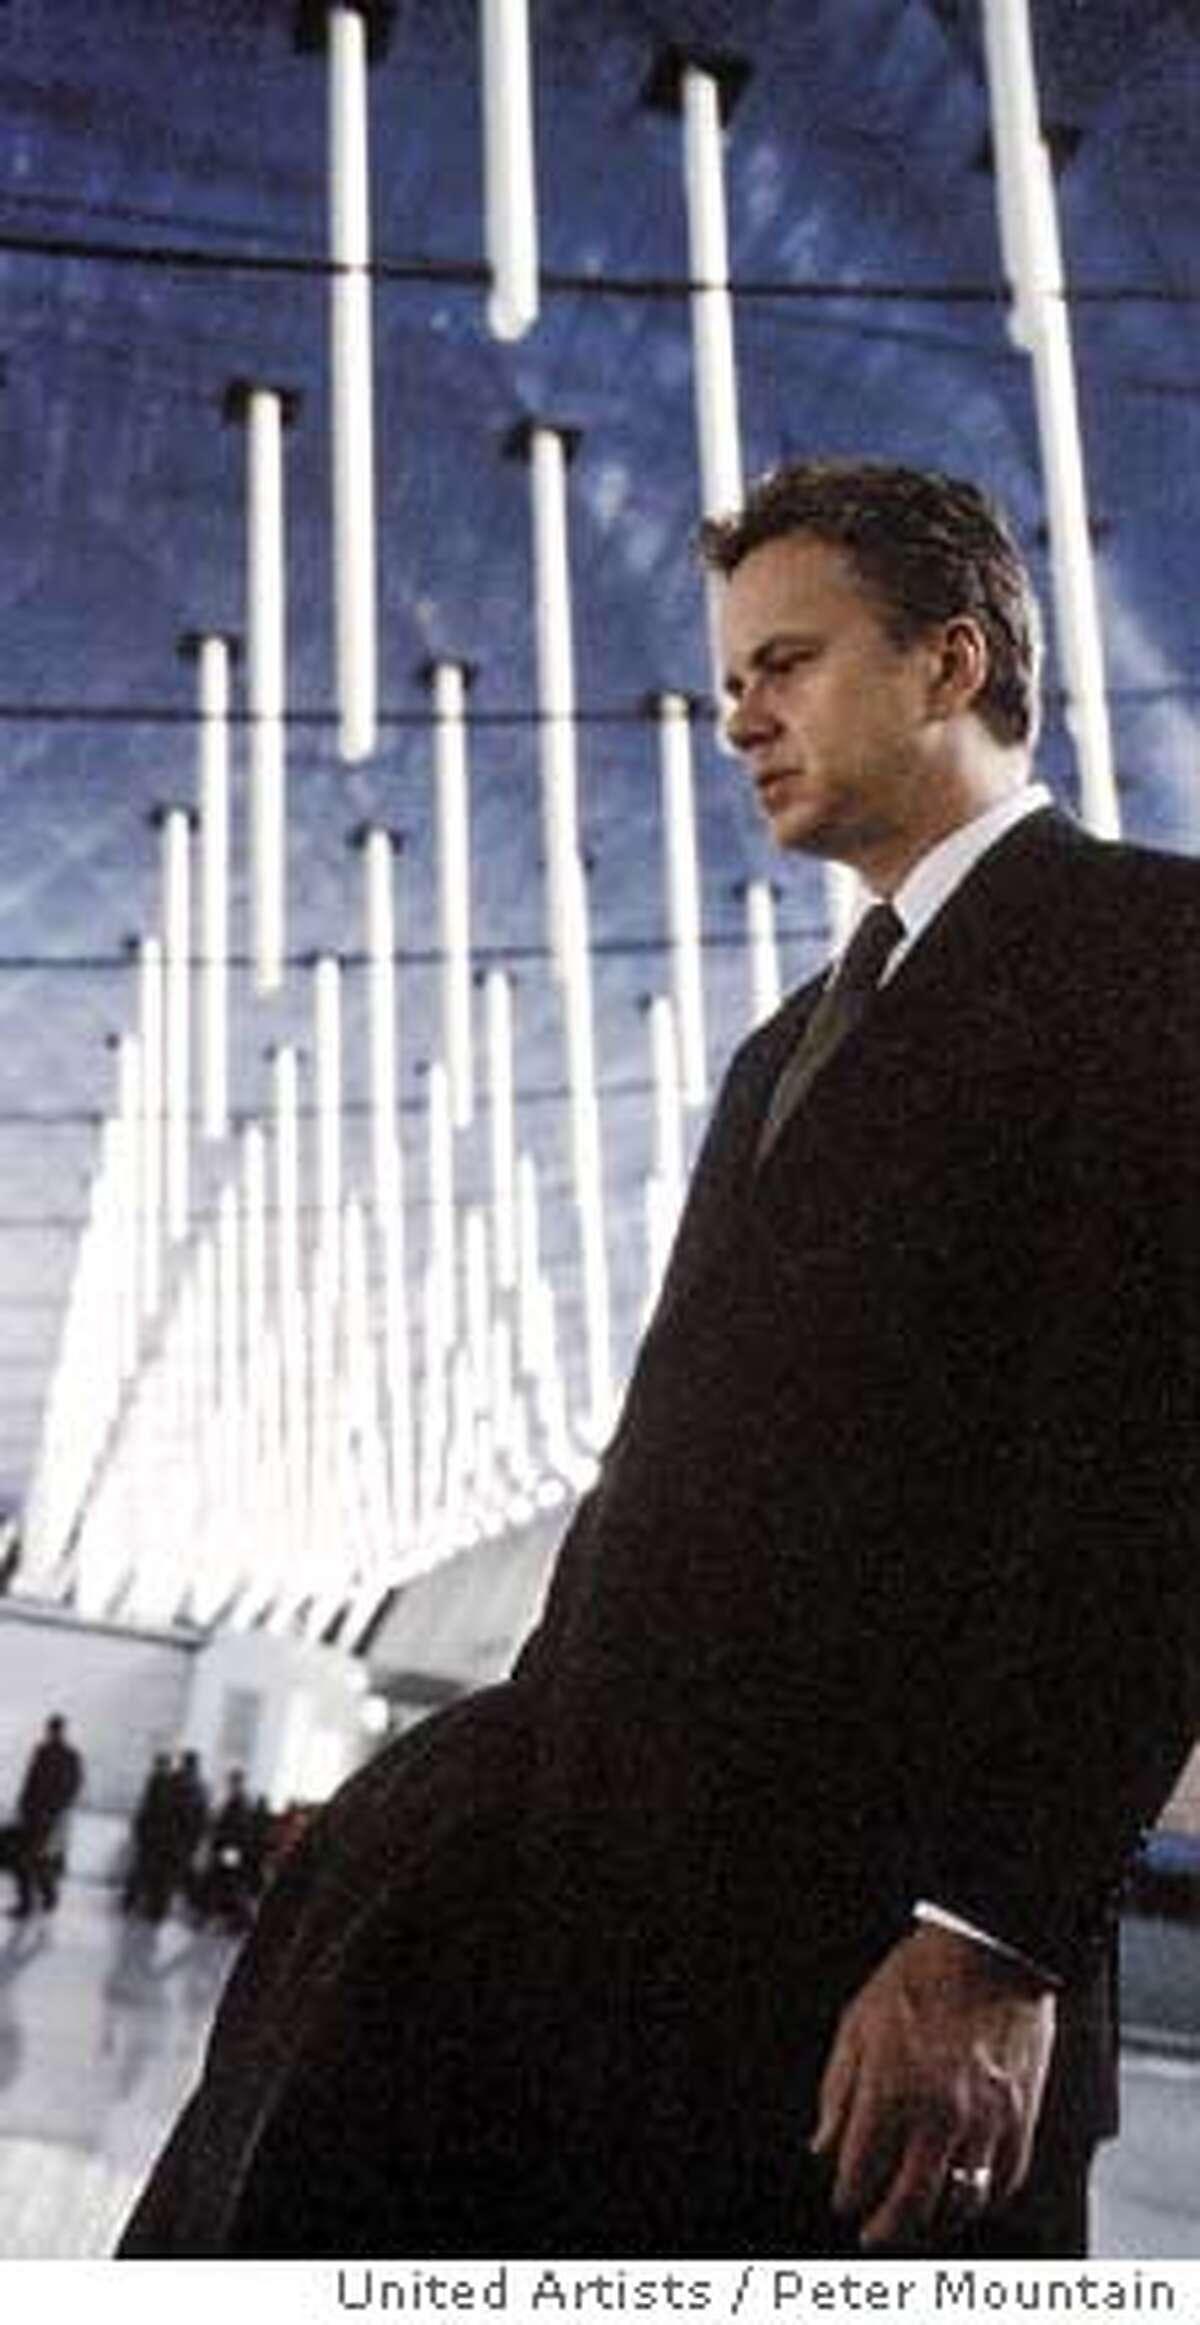 Tim Robbins stars as William, an insurance investigator,in the futuristic drama